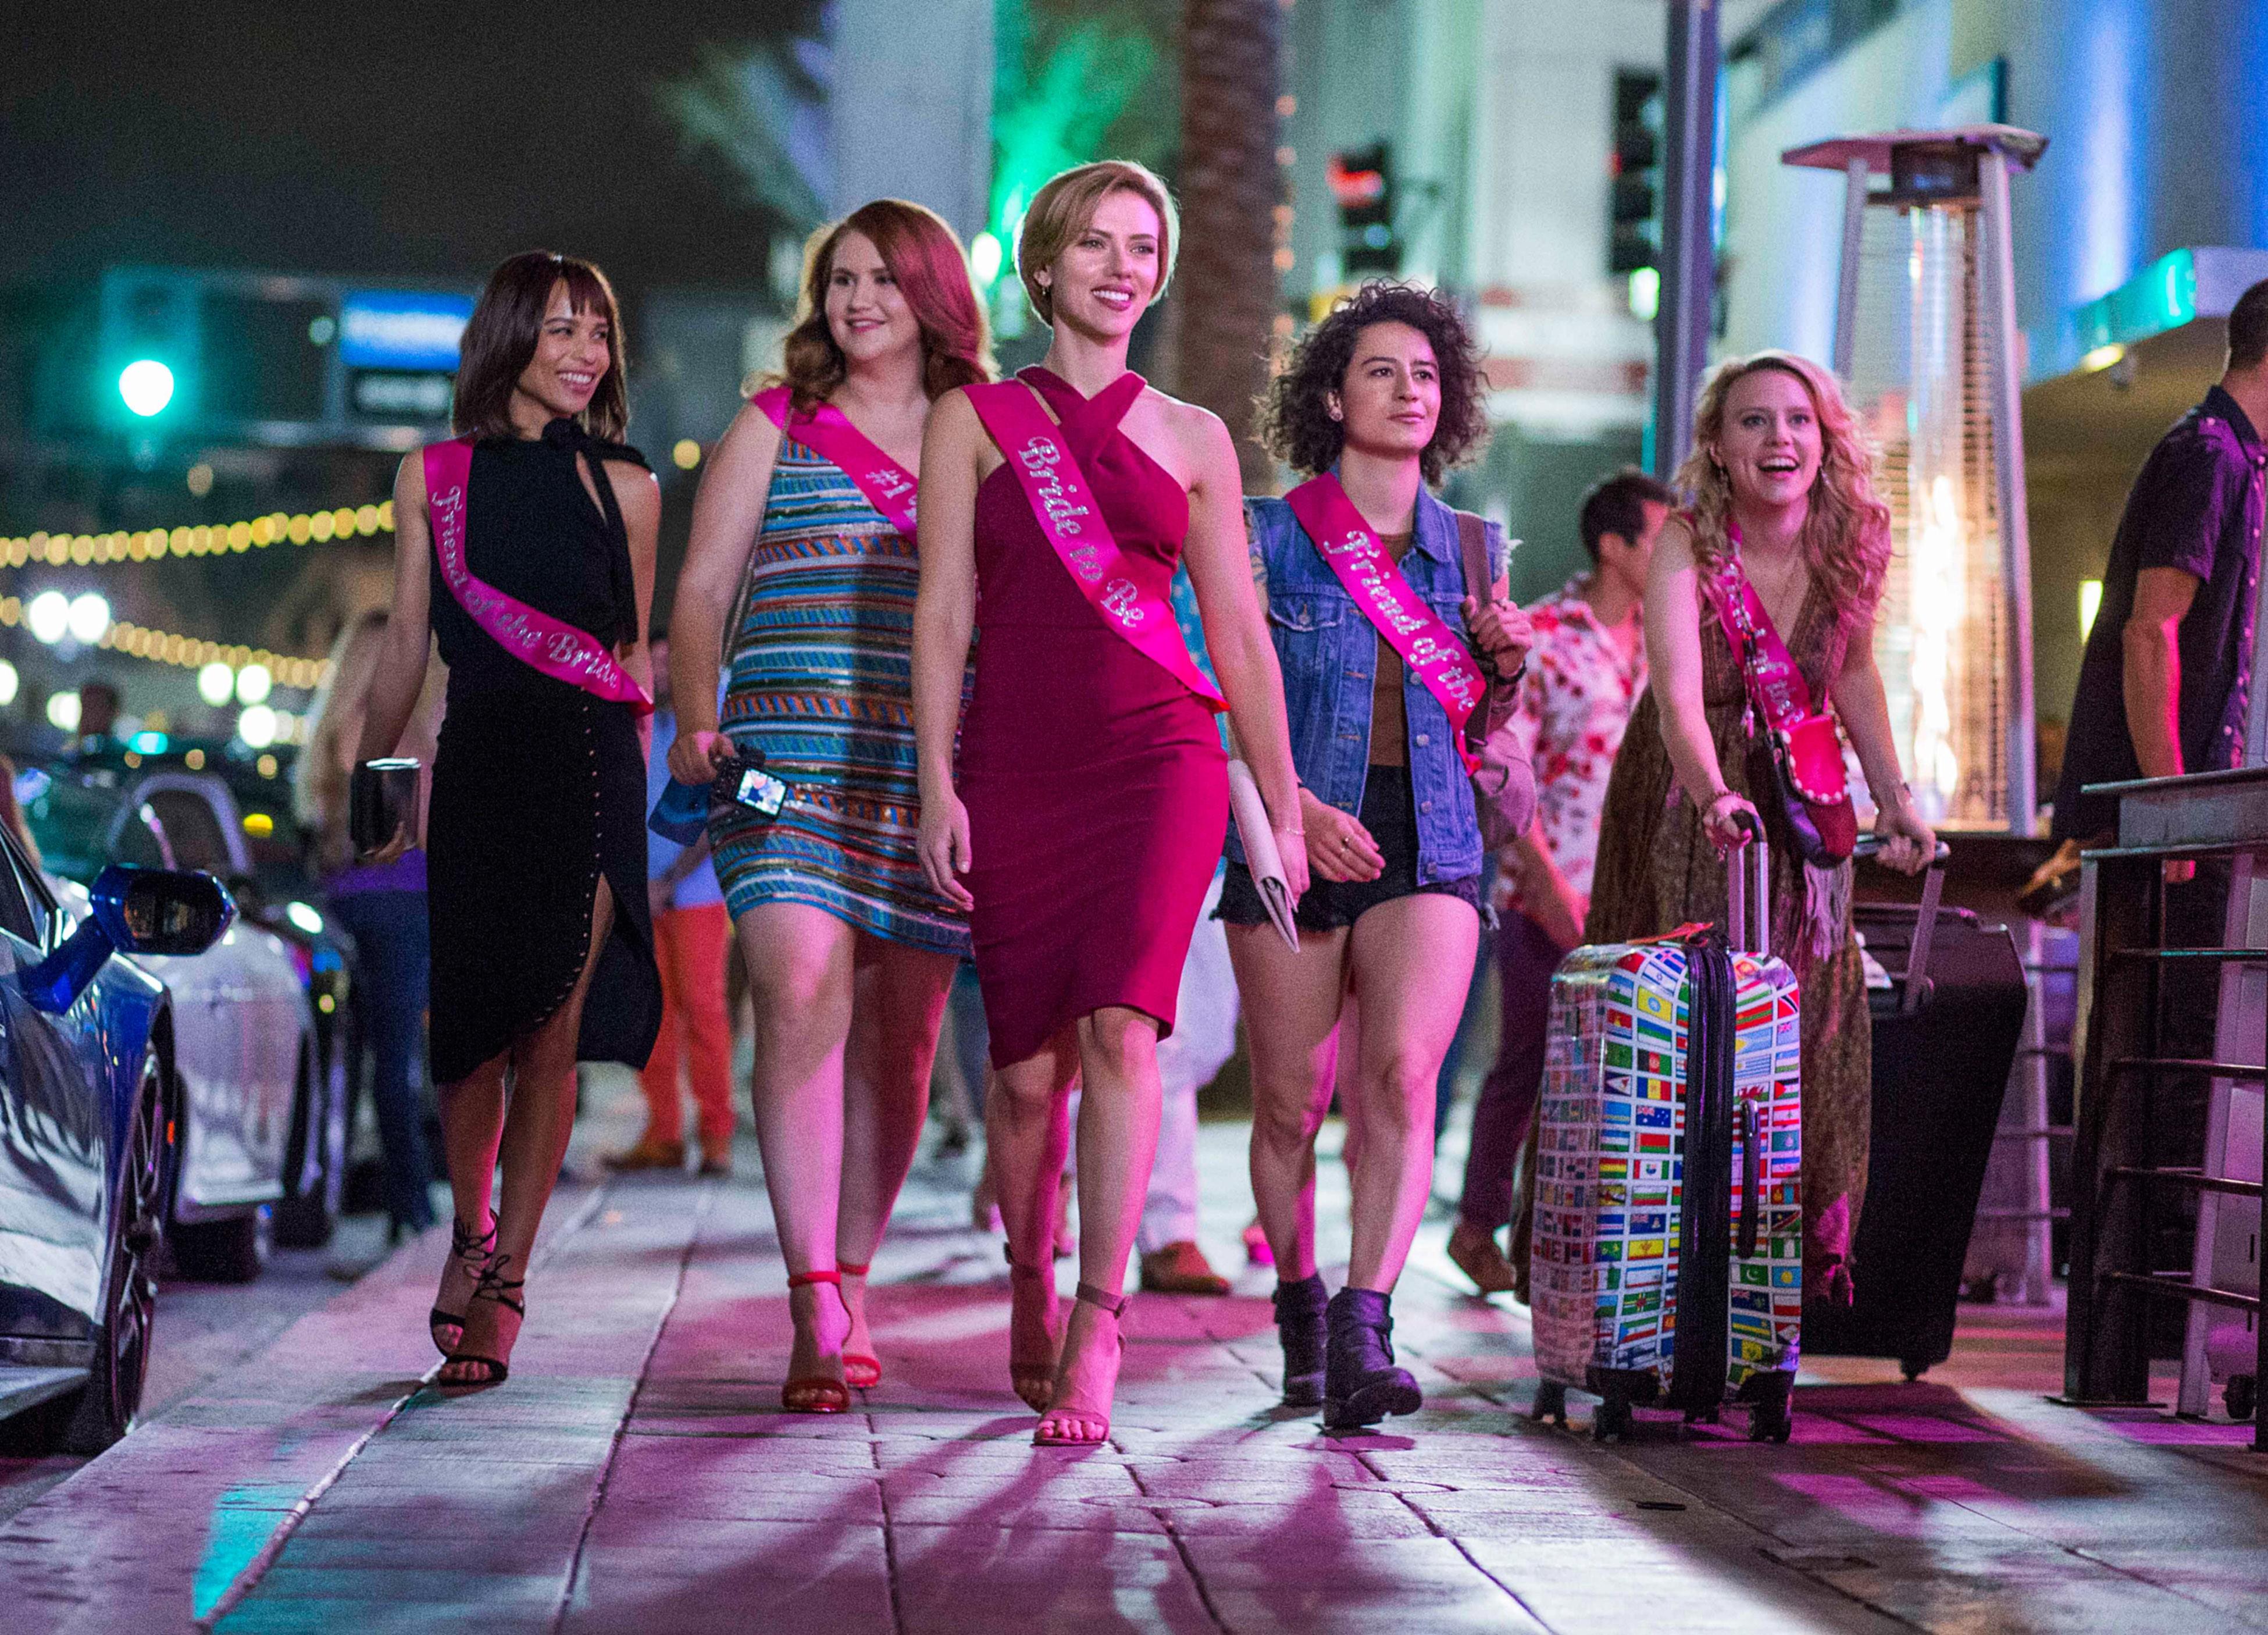 ROUGH NIGHT, from left: Zoe Kravitz, Jillian Bell, Scarlett Johansson, Ilana Glazer, Kate McKinnon, 2017.